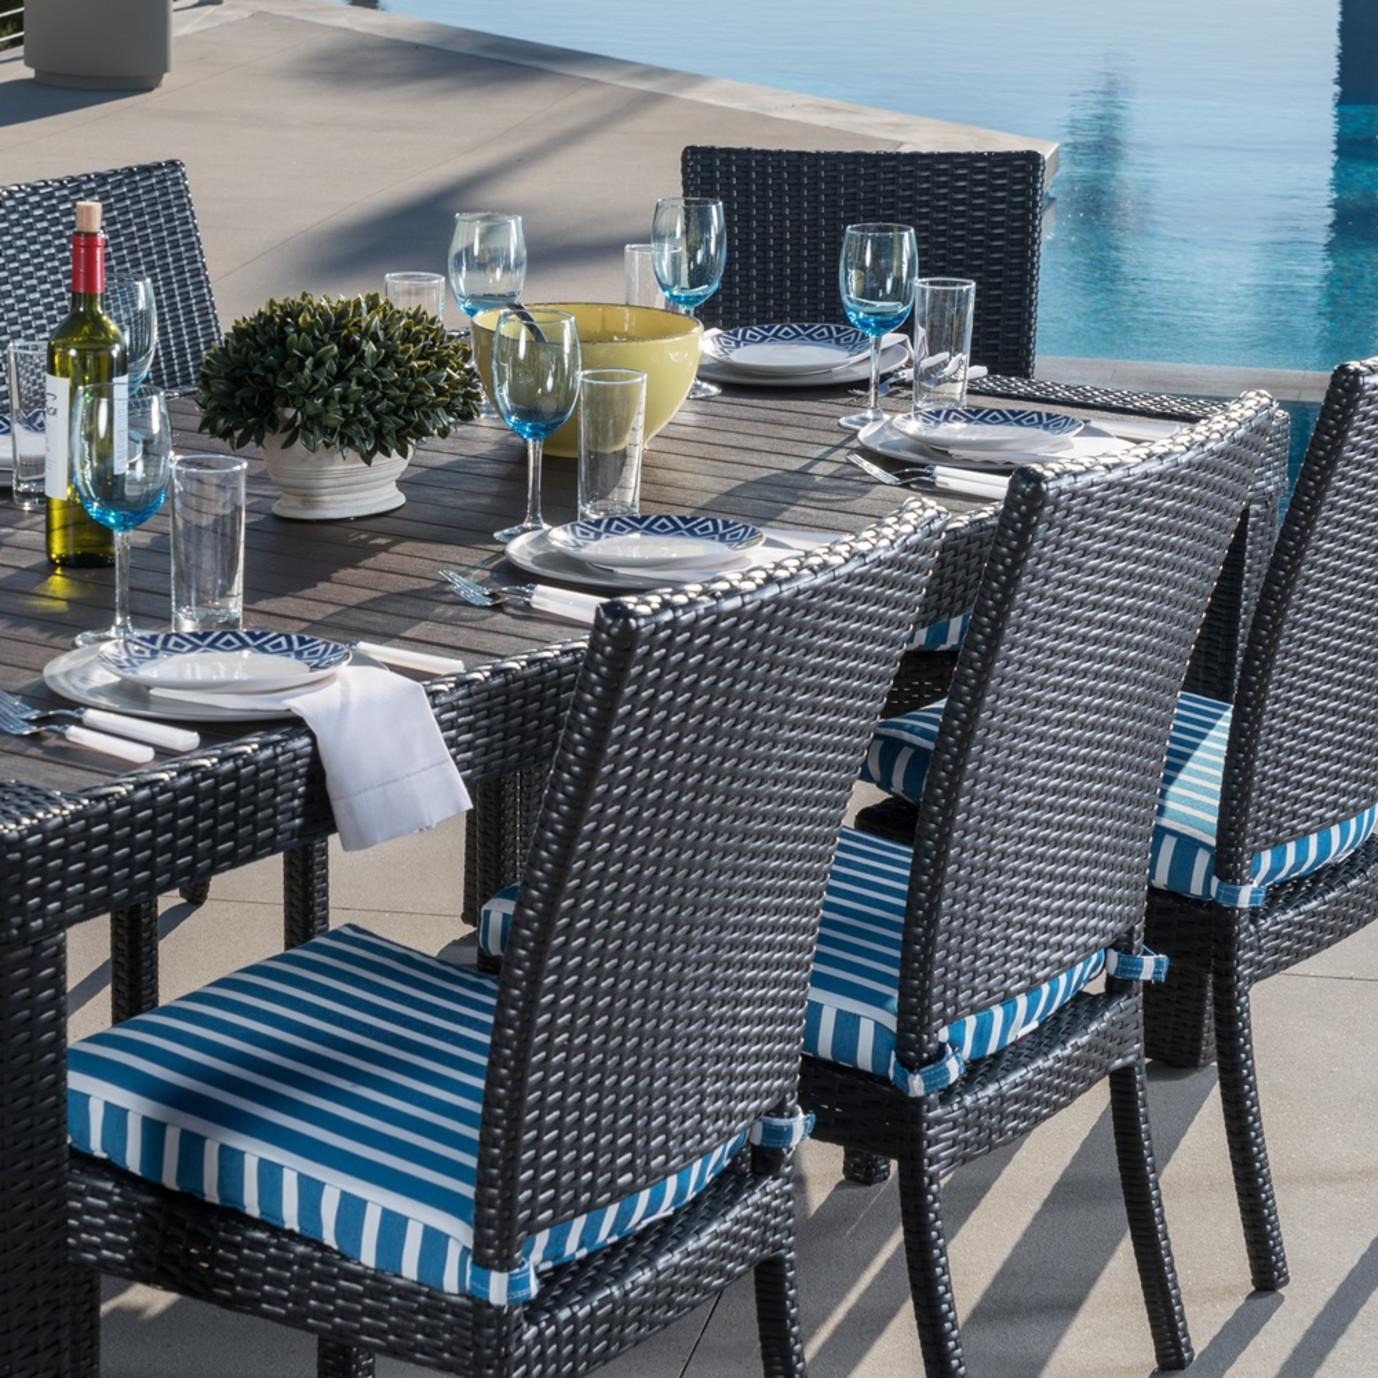 Deco™ 9pc Dining Set - Regatta Blue